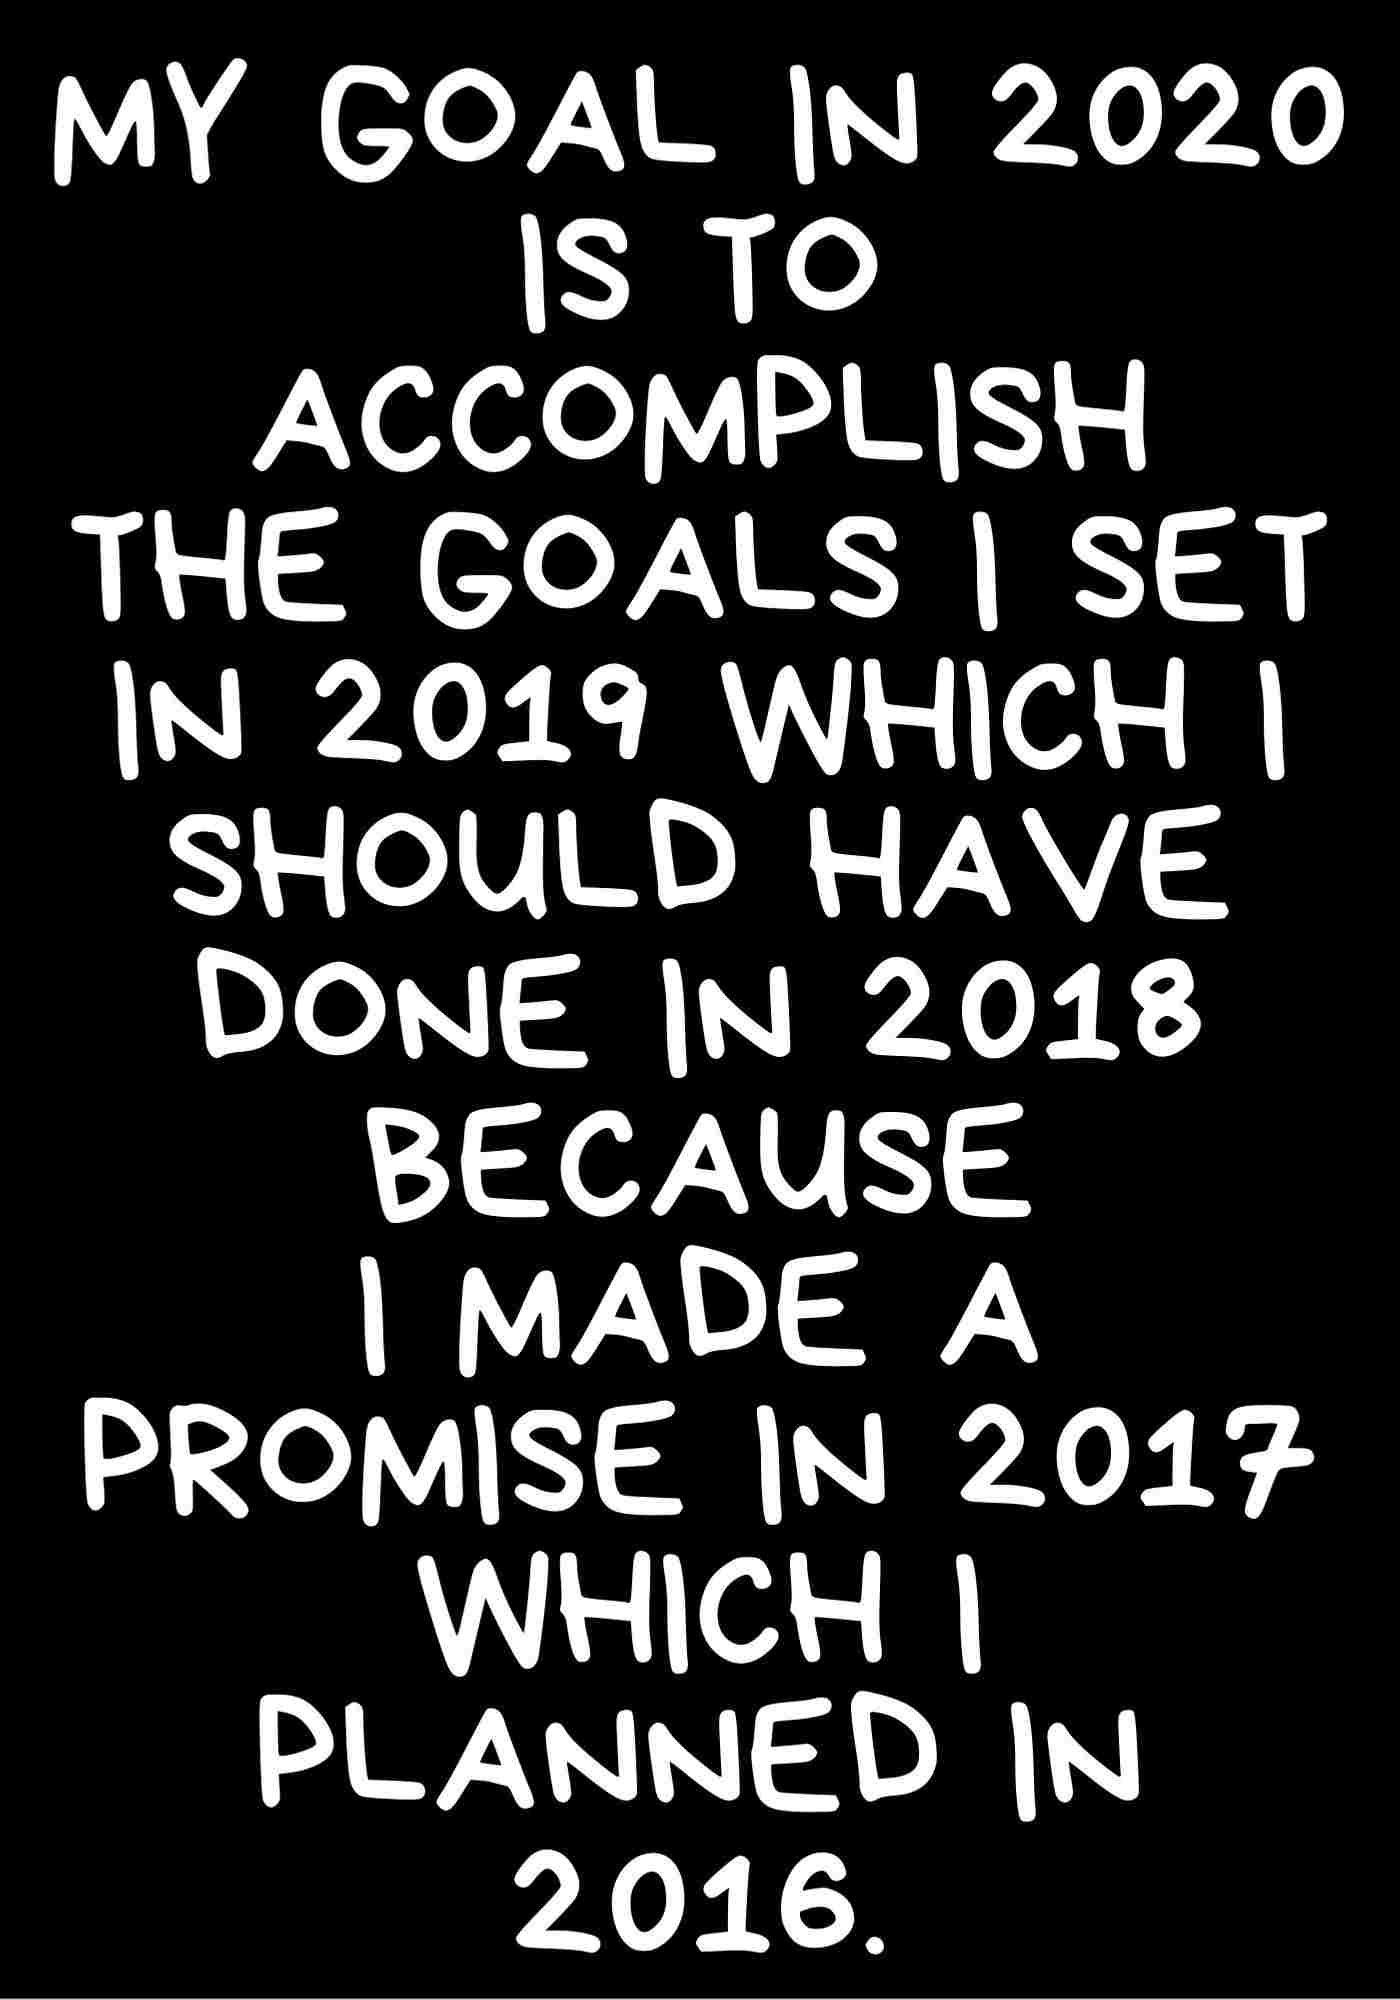 2020 Funny Quotes : funny, quotes, Goals, Quotes, Funny, About, Year,, Friday, Funny,